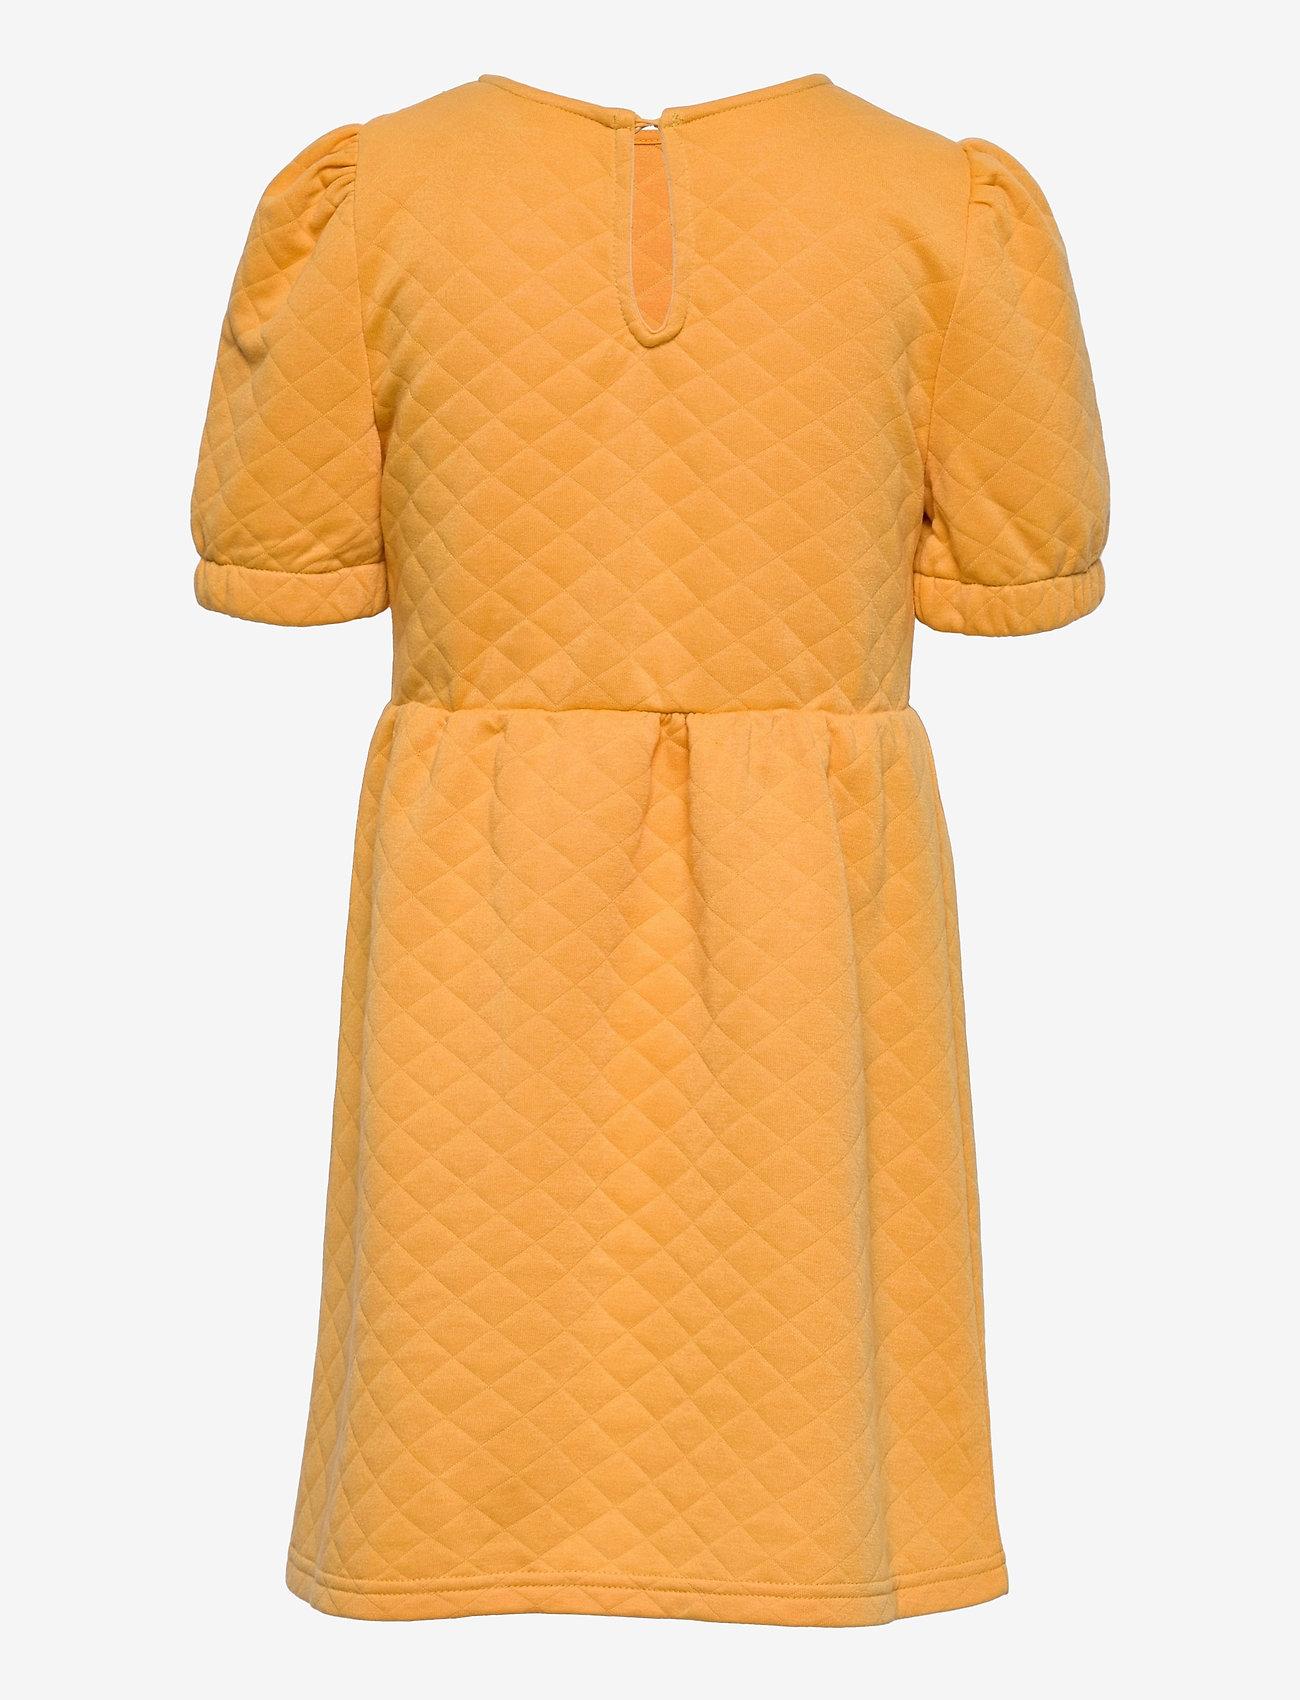 Kids Only - KONMEDINA S/S PUFF DRESS SWT - kleider - cornsilk - 1